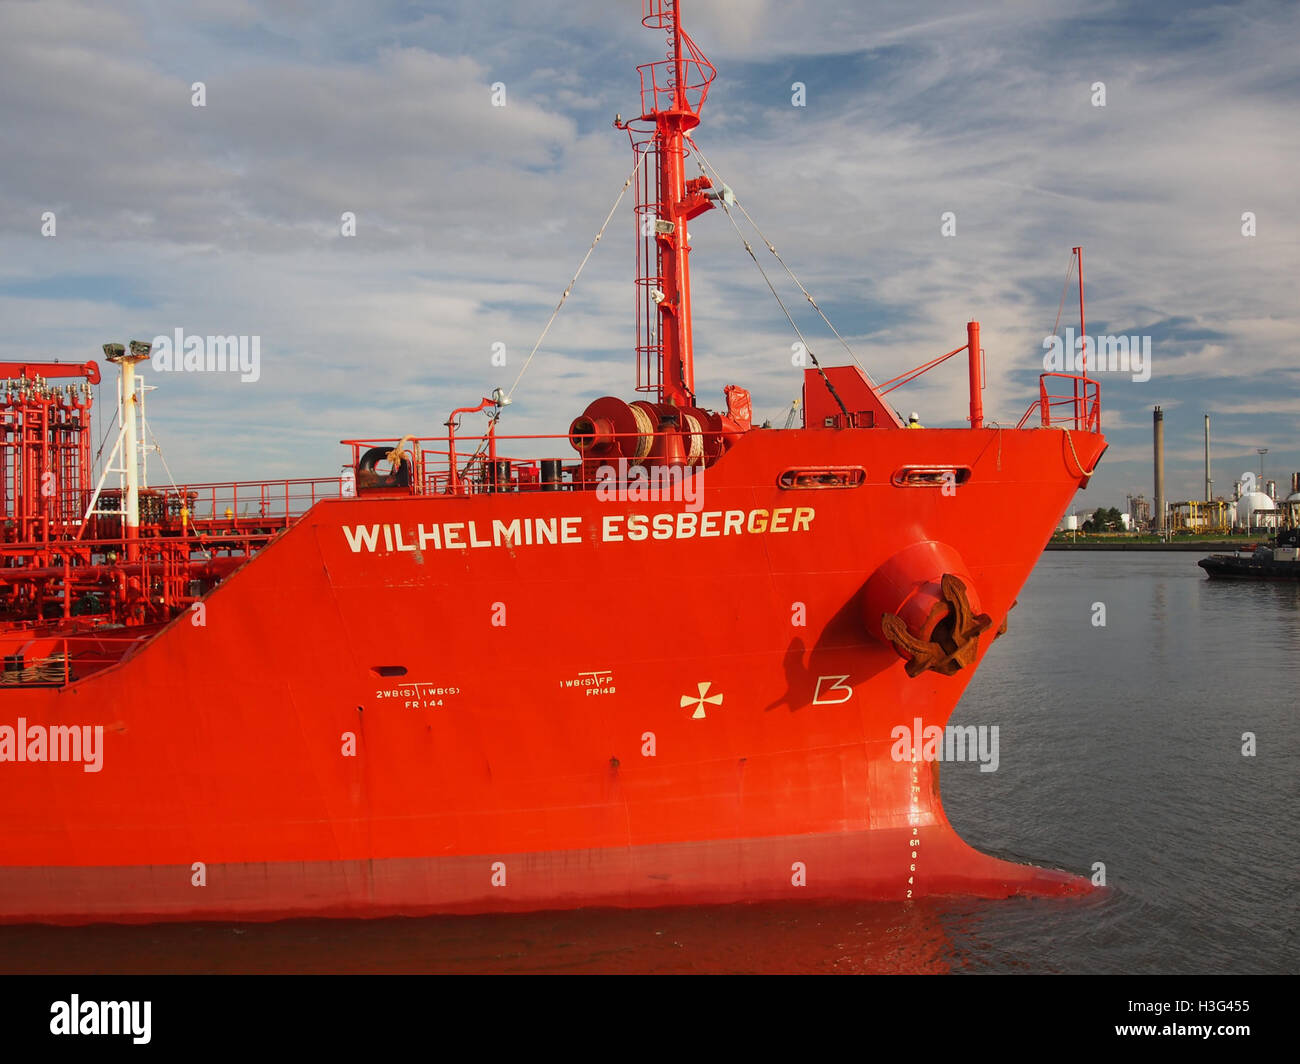 Wilhelmine Essberger (ship, 2005) IMO 9295440 Port of Antwerp pic4 - Stock Image